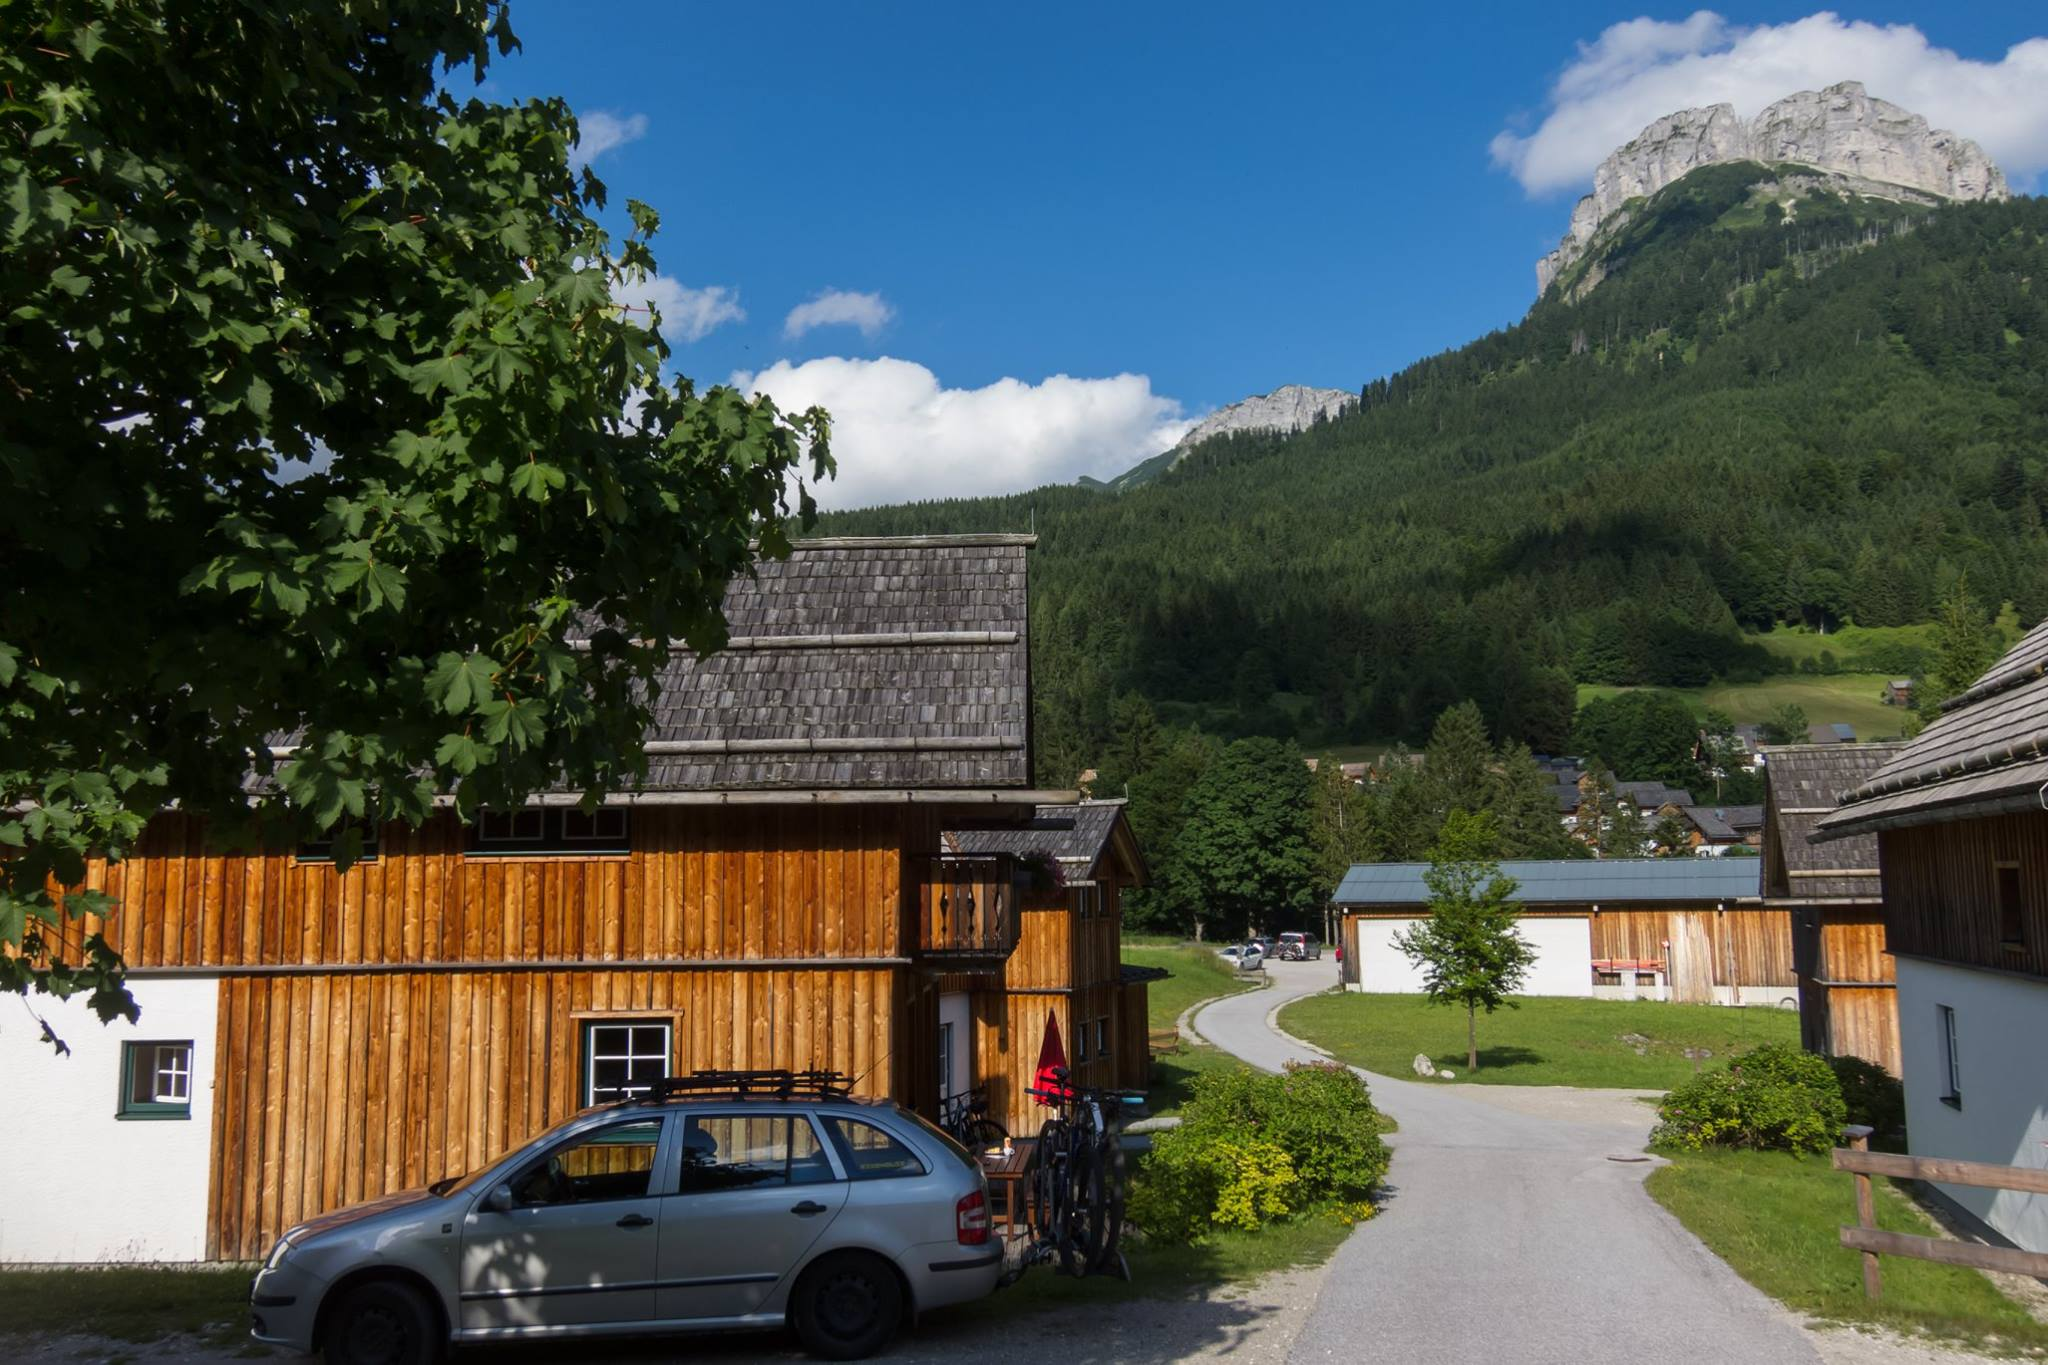 salzkammergut-trophy-mountain-bike-blog-3.jpg